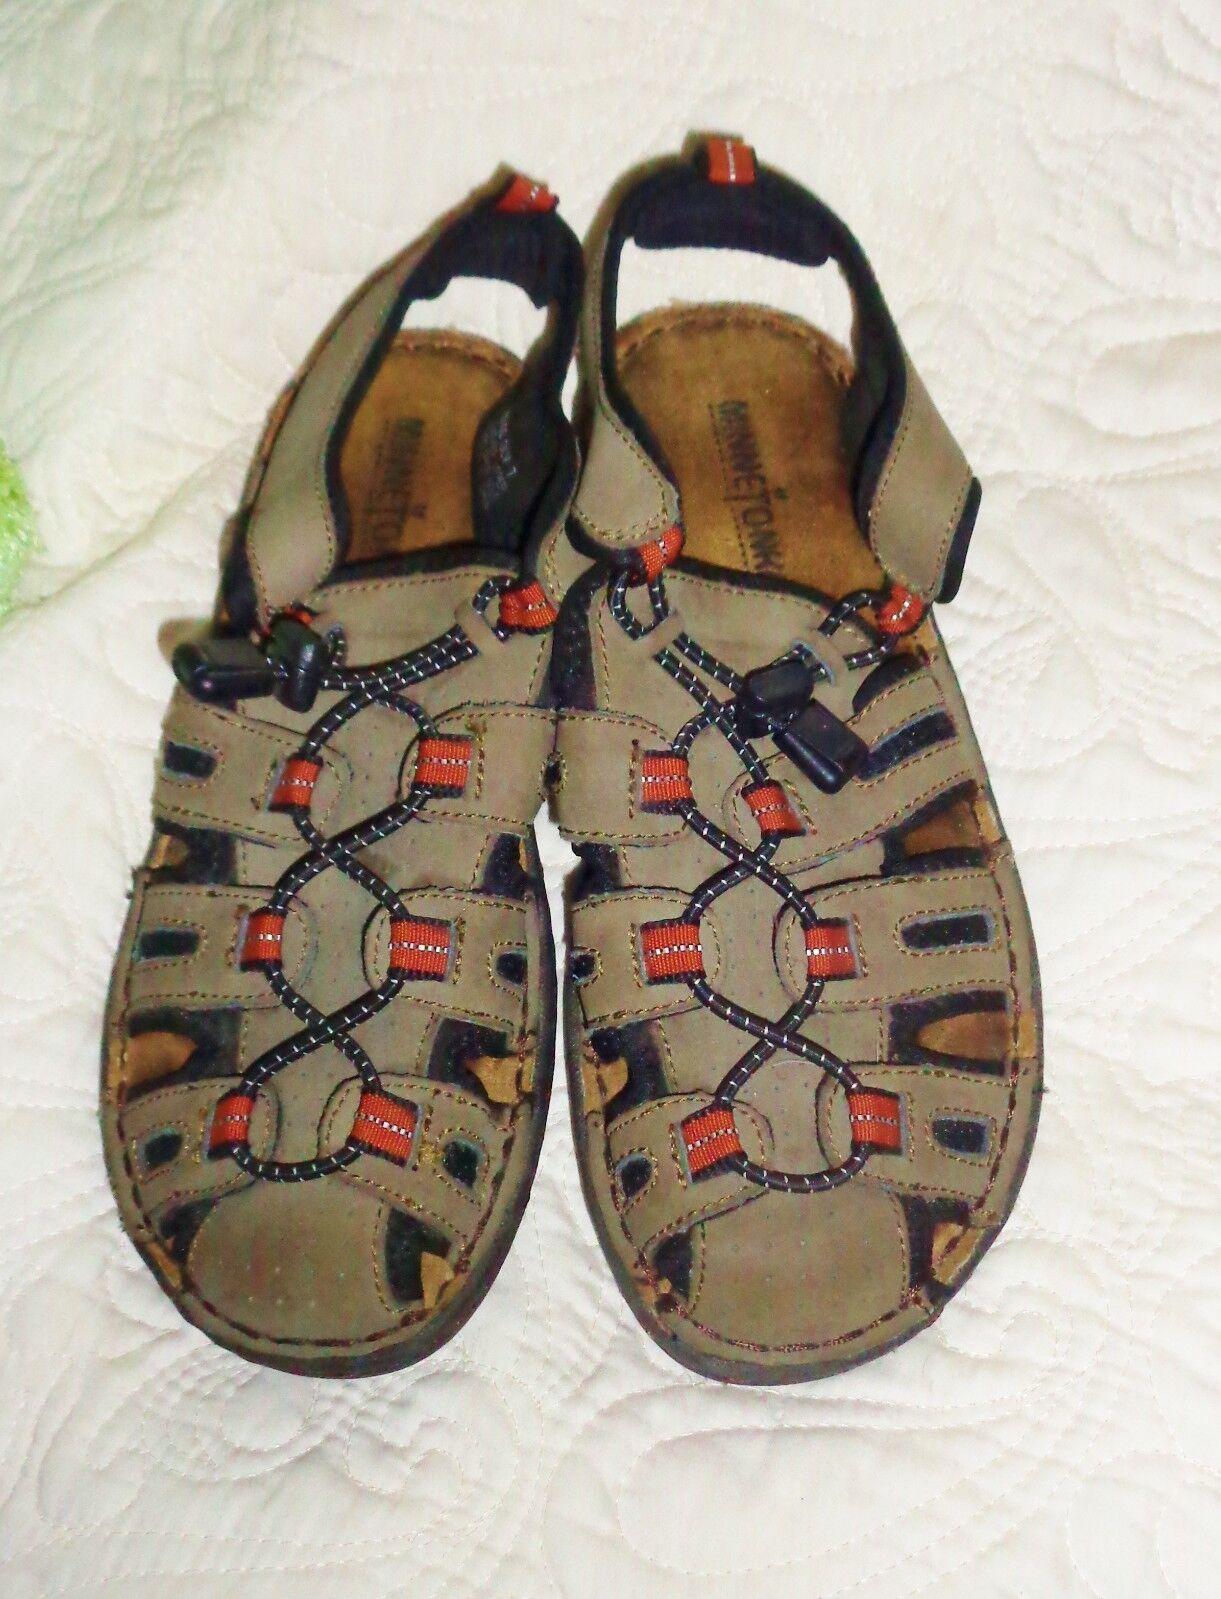 Women's Minnetonka Sandals Brown Leather Slip On Sandals Minnetonka Shoes Adjustable Closed Toe 7 d535b5